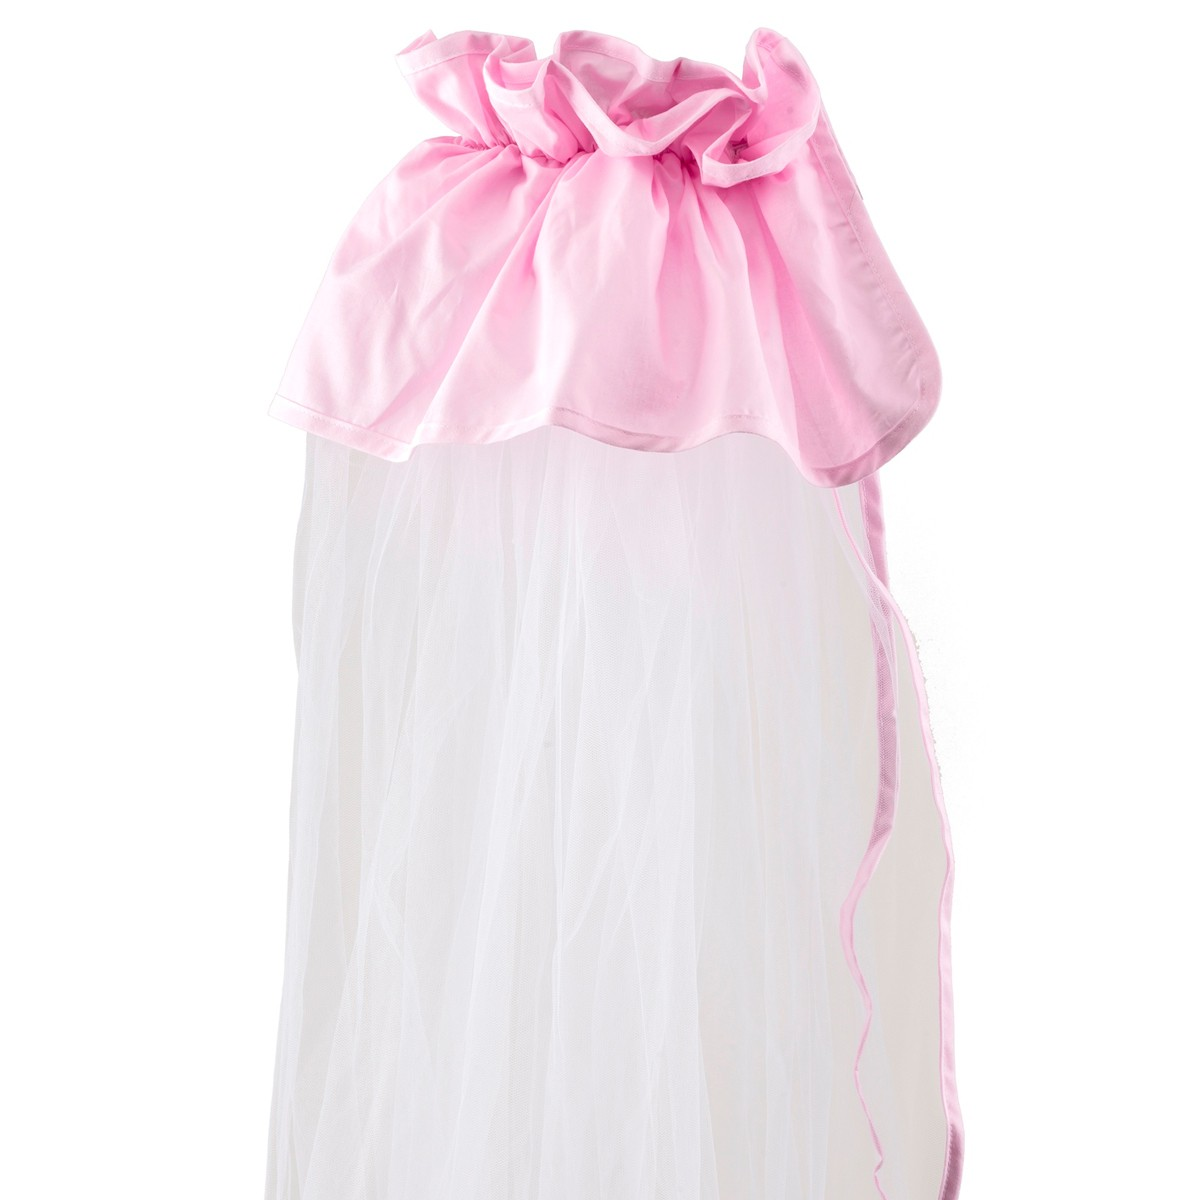 a54f1630708 Spiti Shop Κουνουπιέρα Κούνιας Κόσμος Του Μωρού 0772 Μονόχρωμη Ροζ